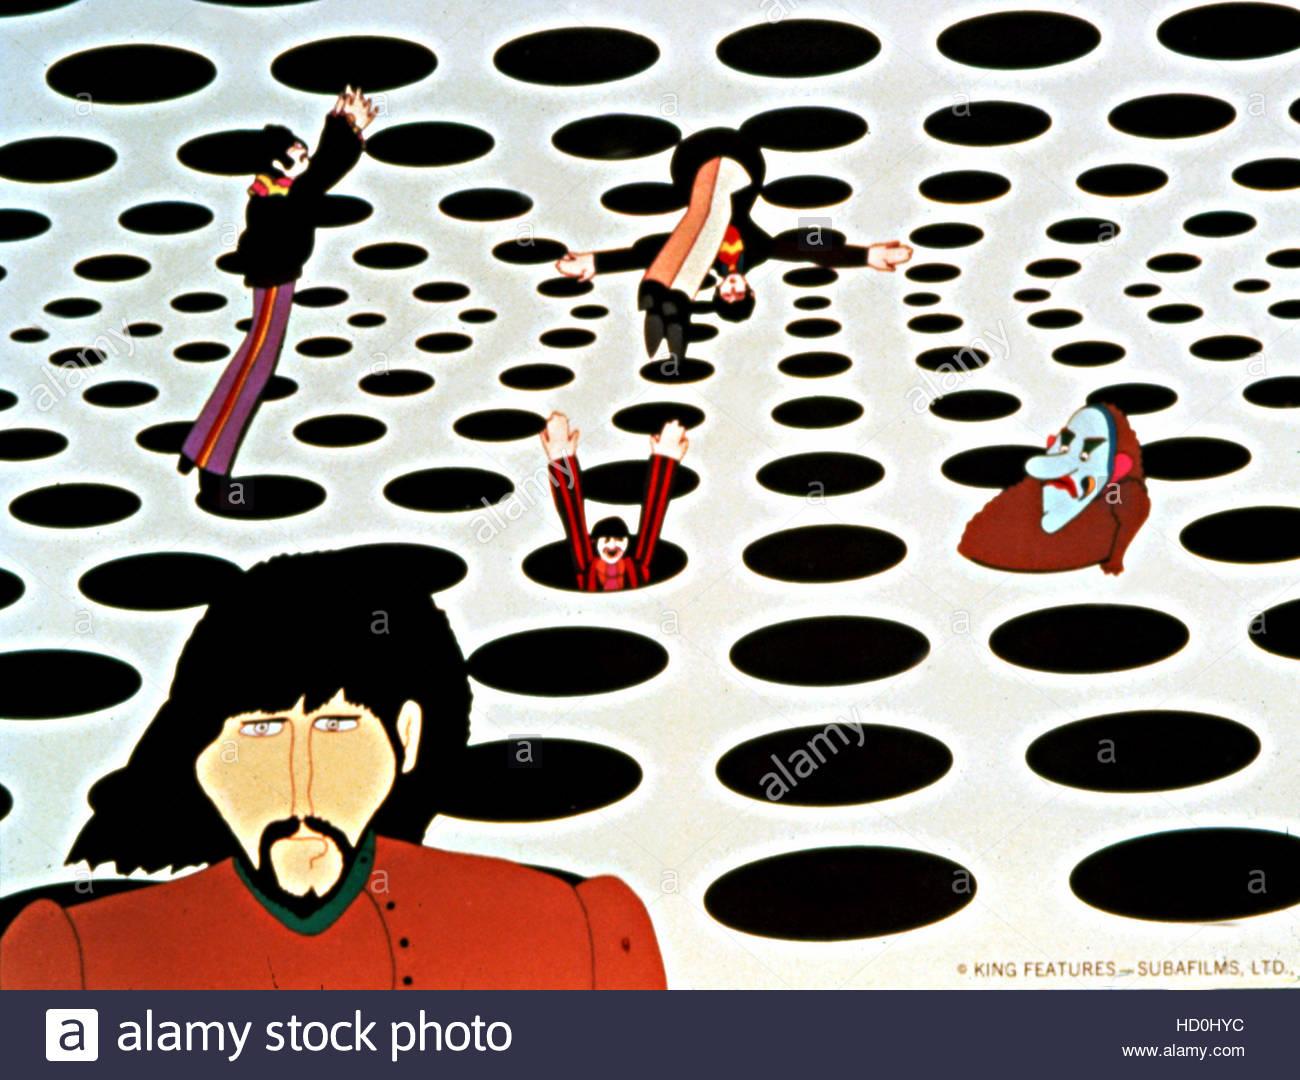 YELLOW SUBMARINE, The Beatles, with Jeremy, 1968. Stock Photo